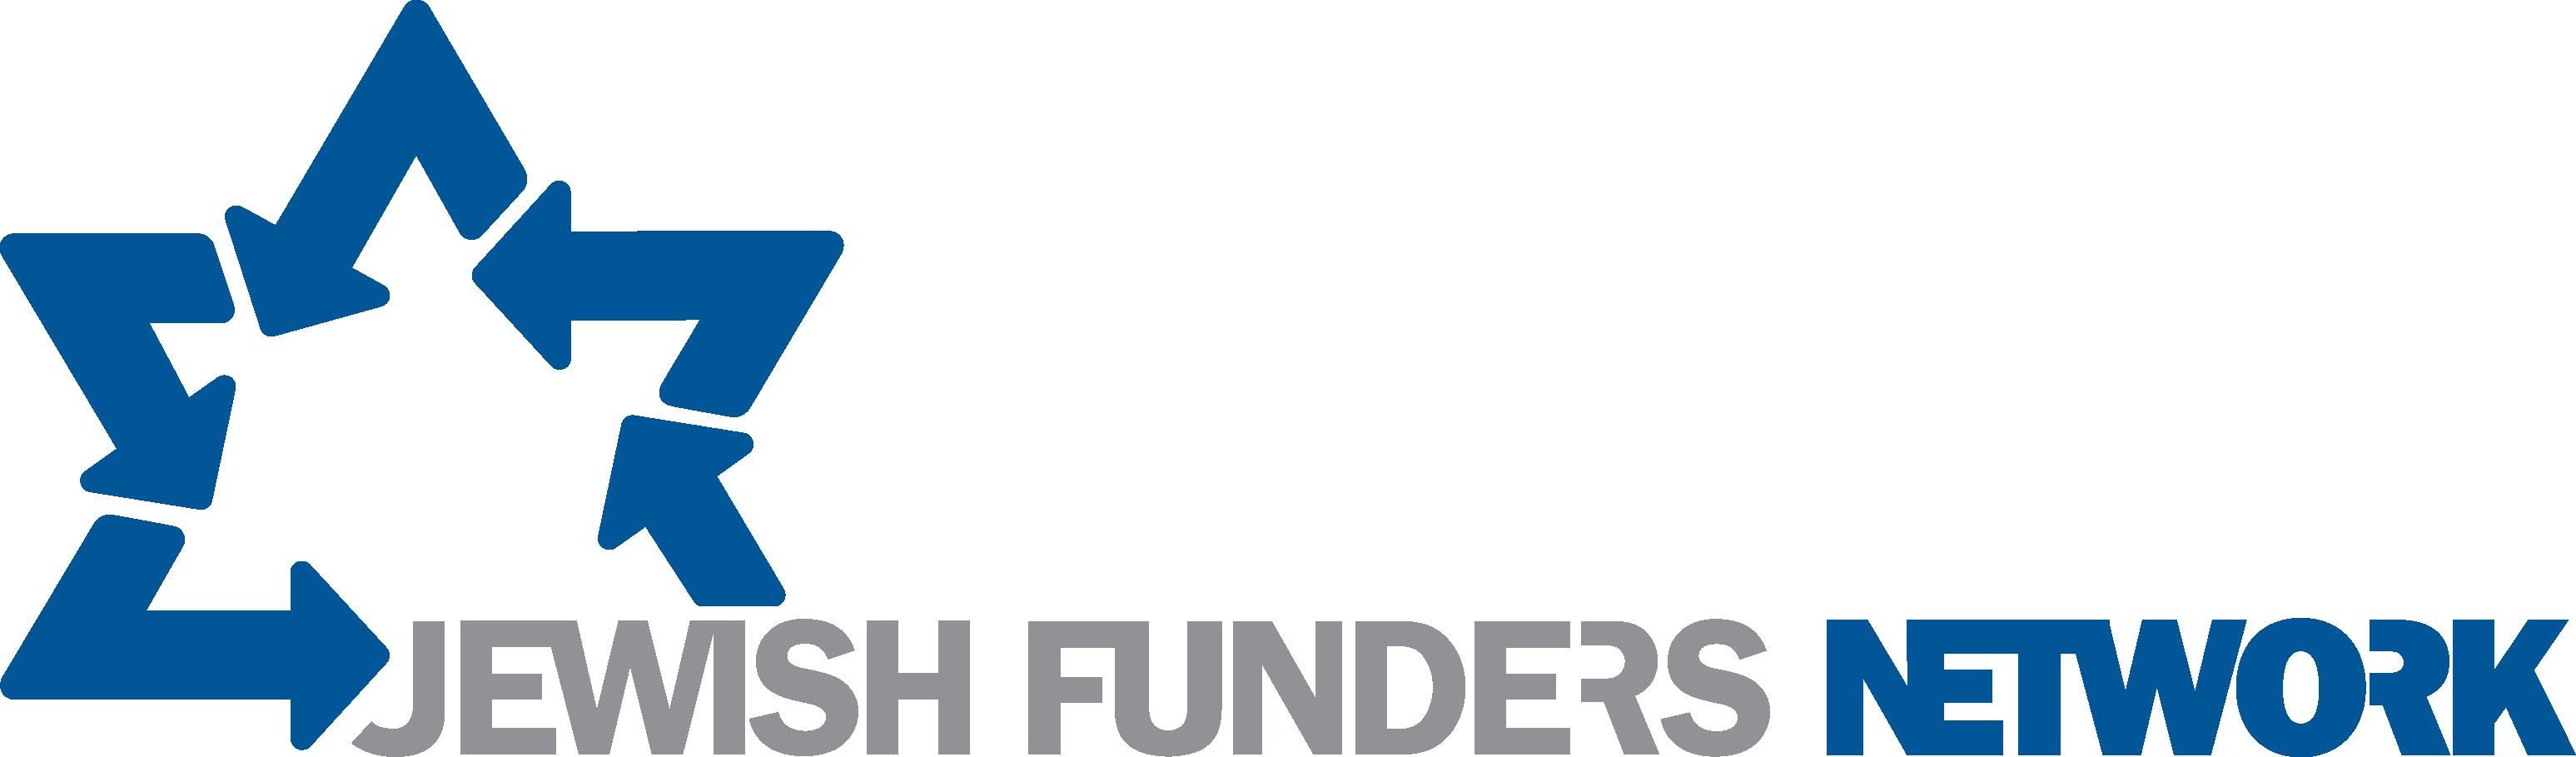 Jewish_Funders_Network_logo_-_horizontal_orientation_-_transparent_background.png